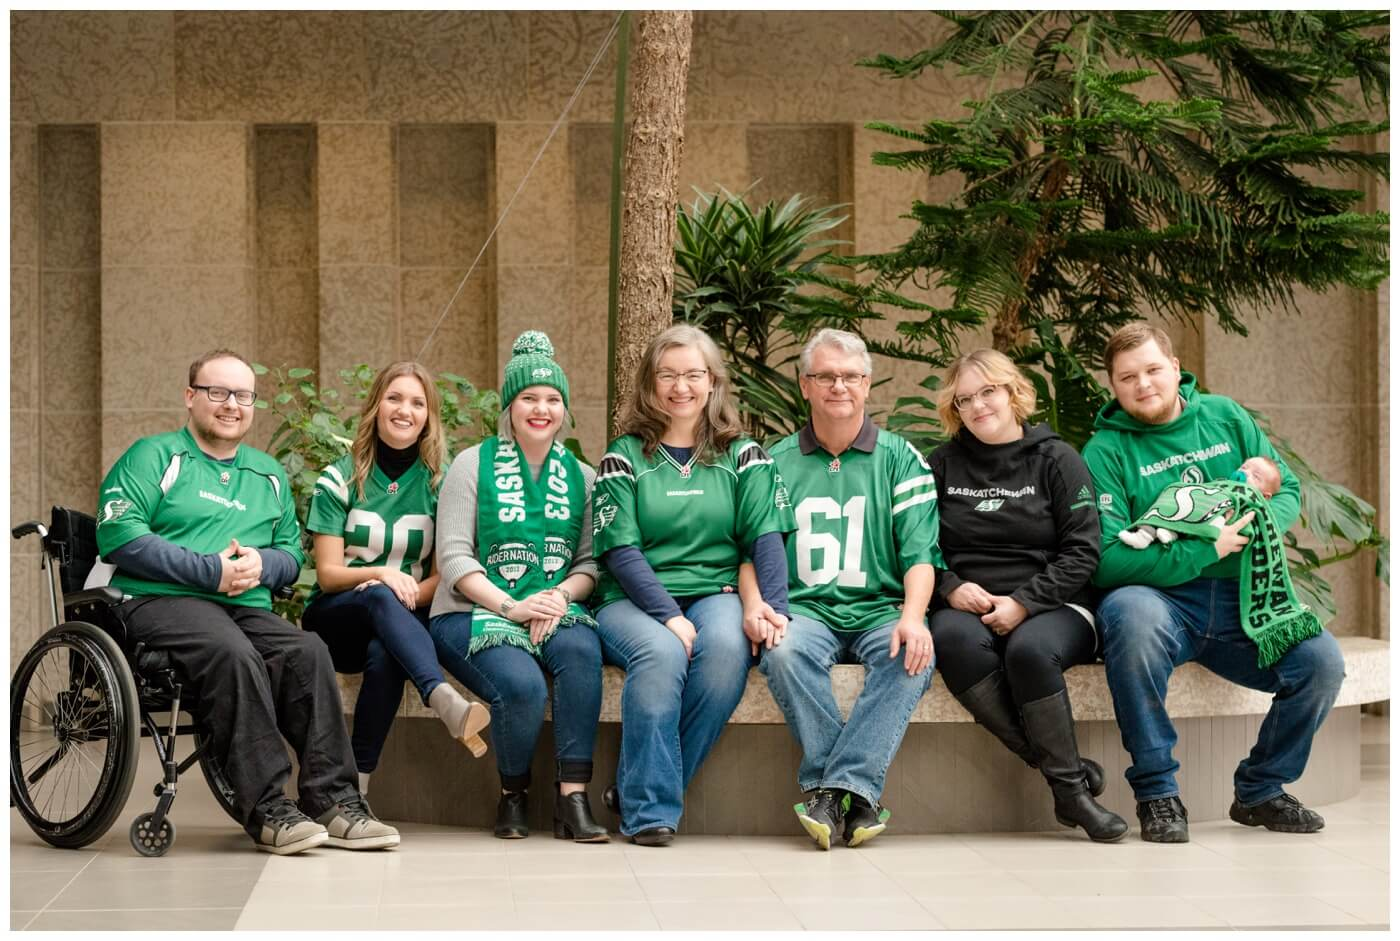 Regina Family Photography - Fahlman Family - Rider Pride - Family Session - TC Douglas Building